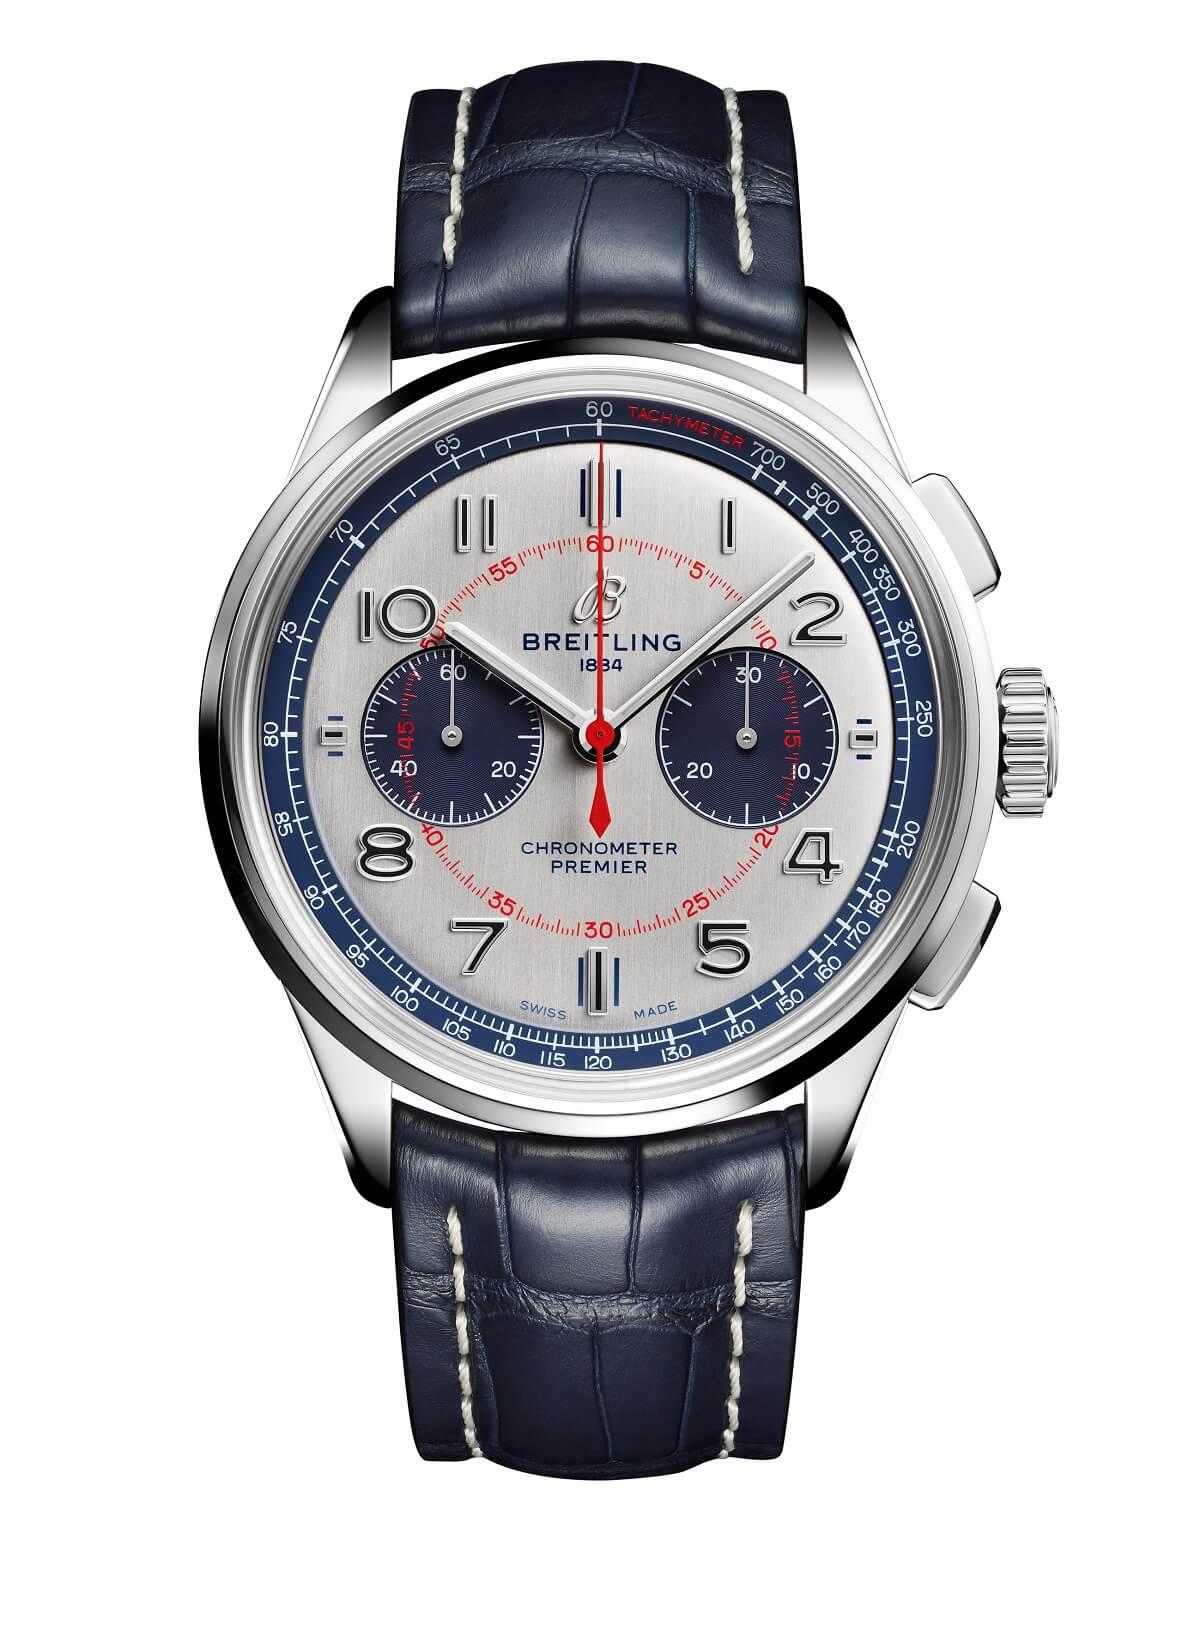 Breitling-Bentley-Mulliner-watch.jpg